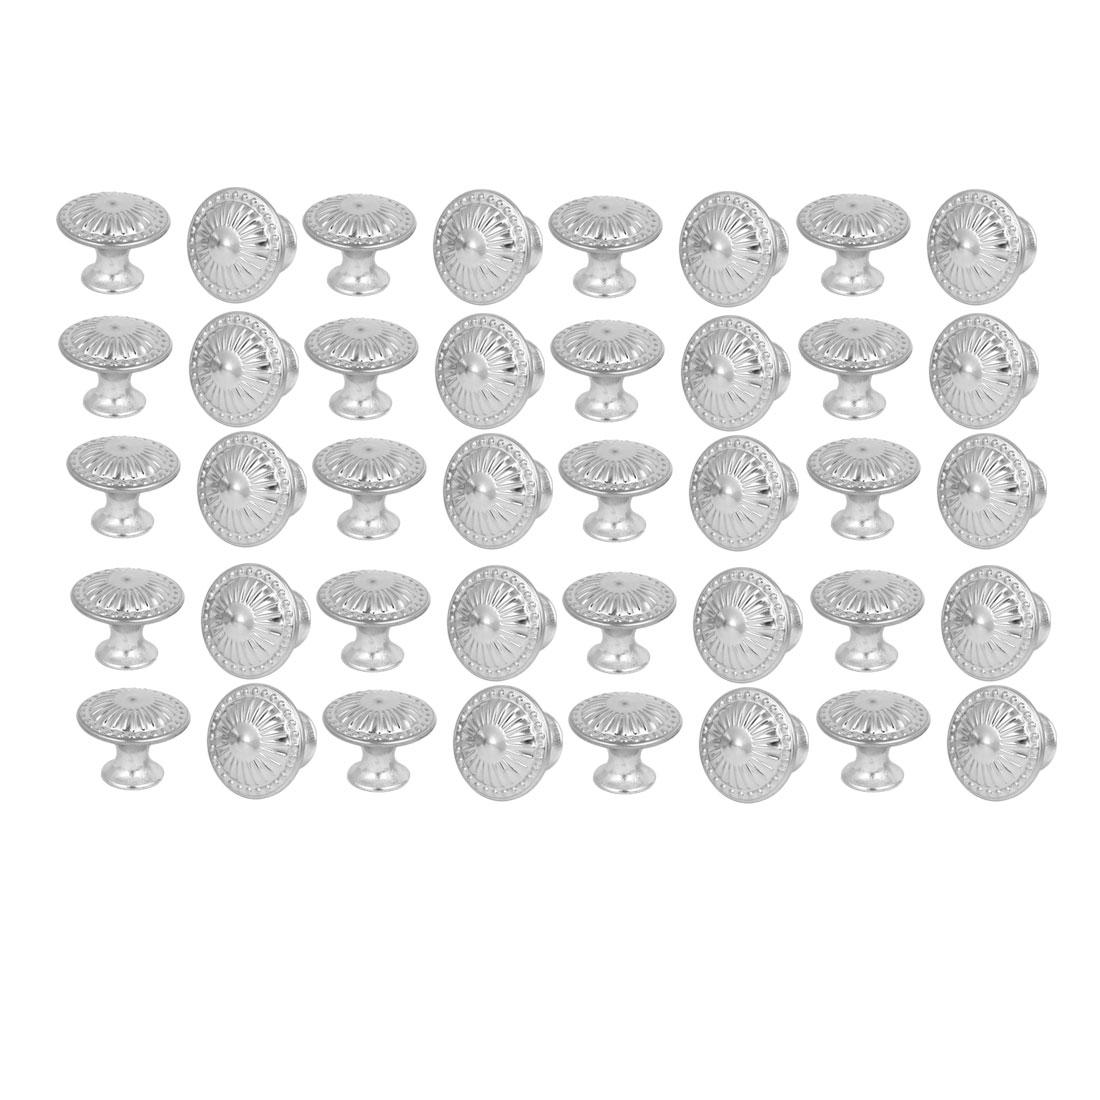 Wardrobe Cabinet Flower Printed Round Pull Knobs Silver Tone 28mmx22mm 40pcs